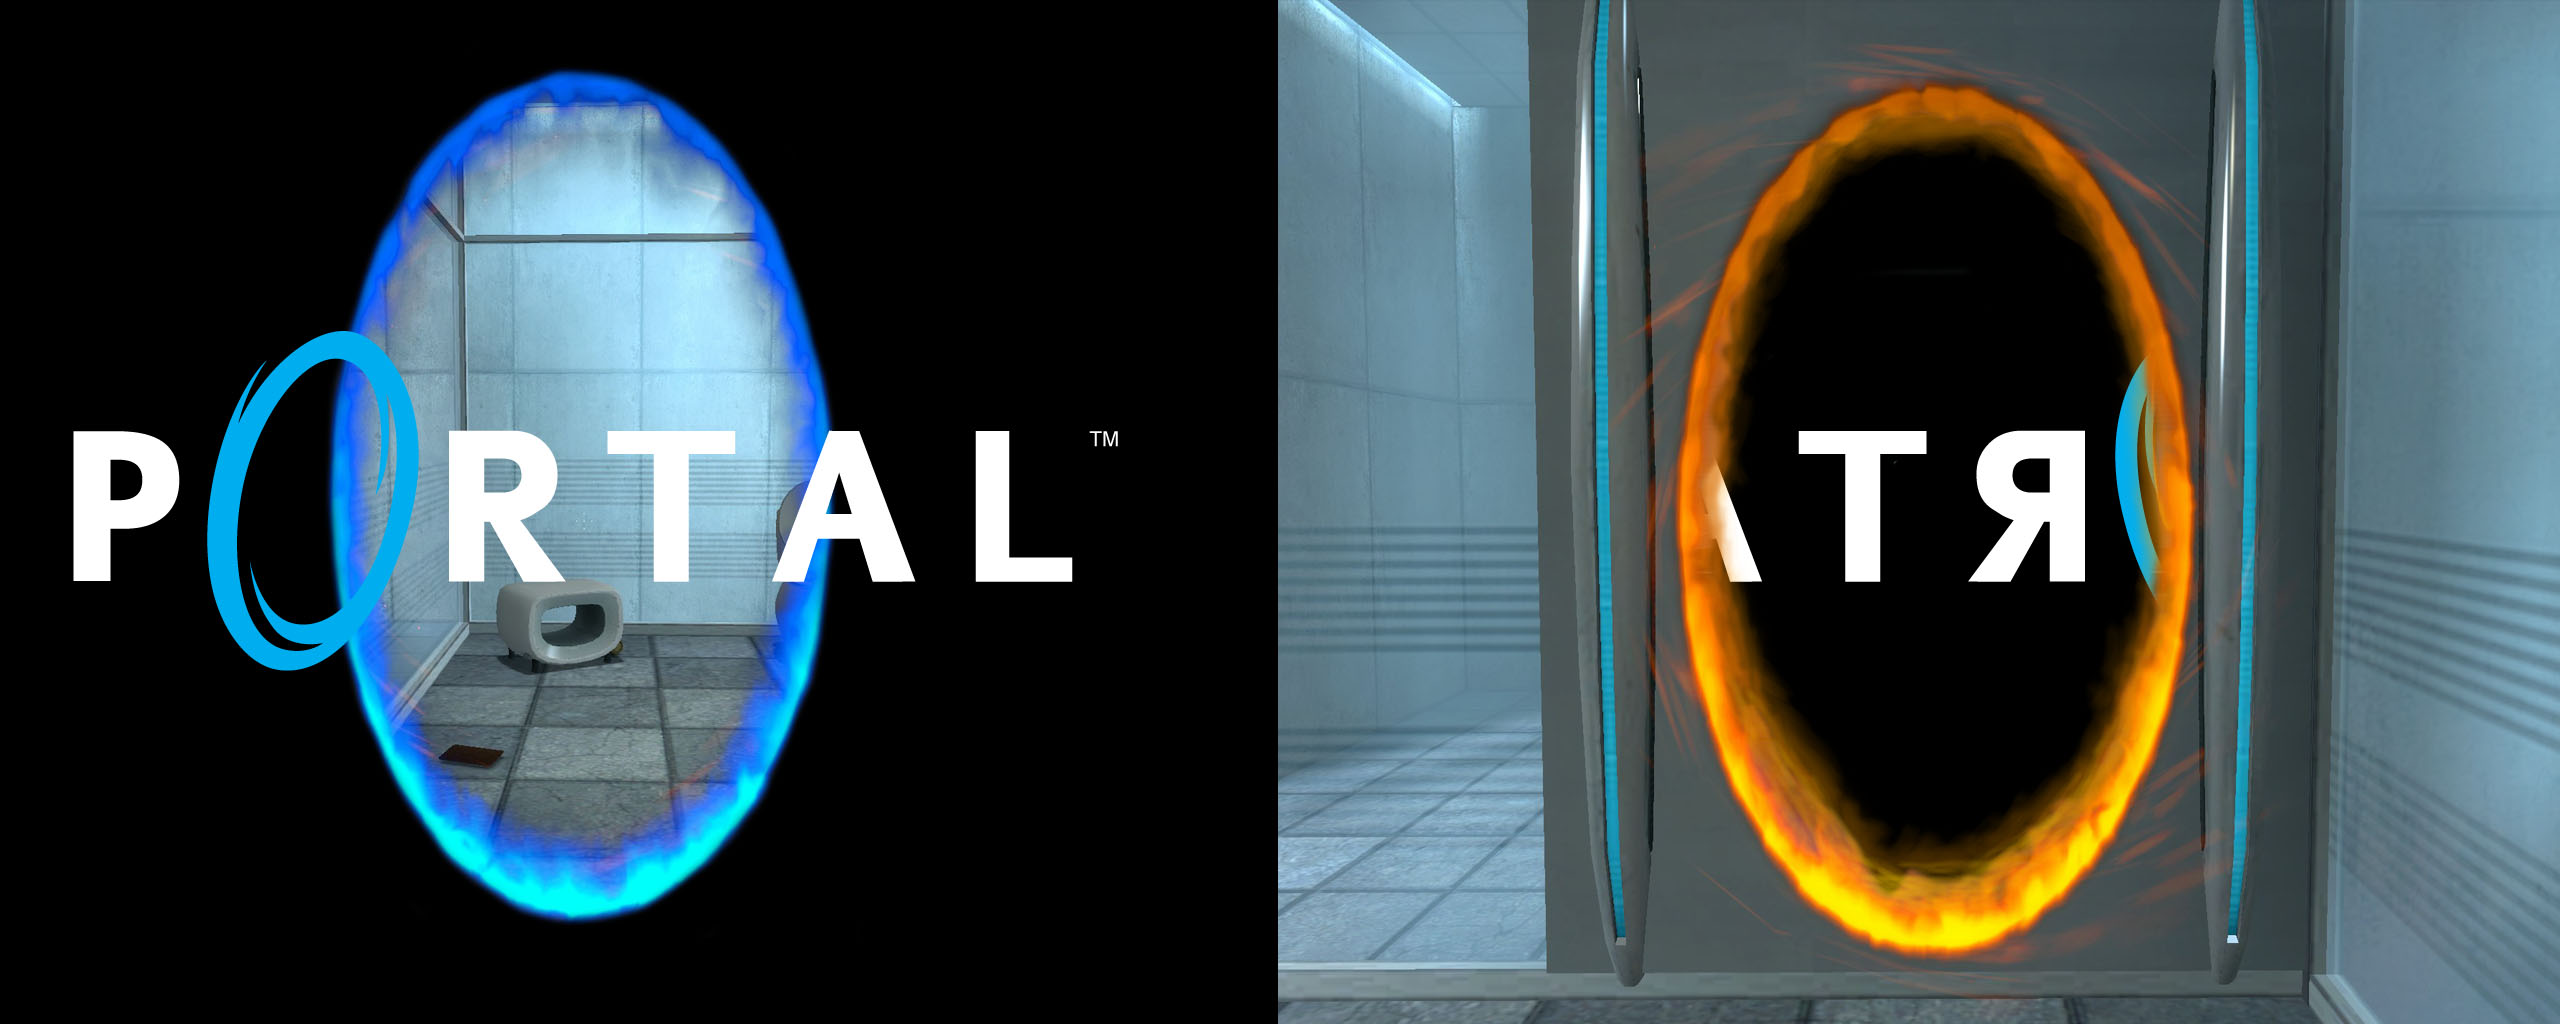 portal 2 wallpaper dual - photo #31